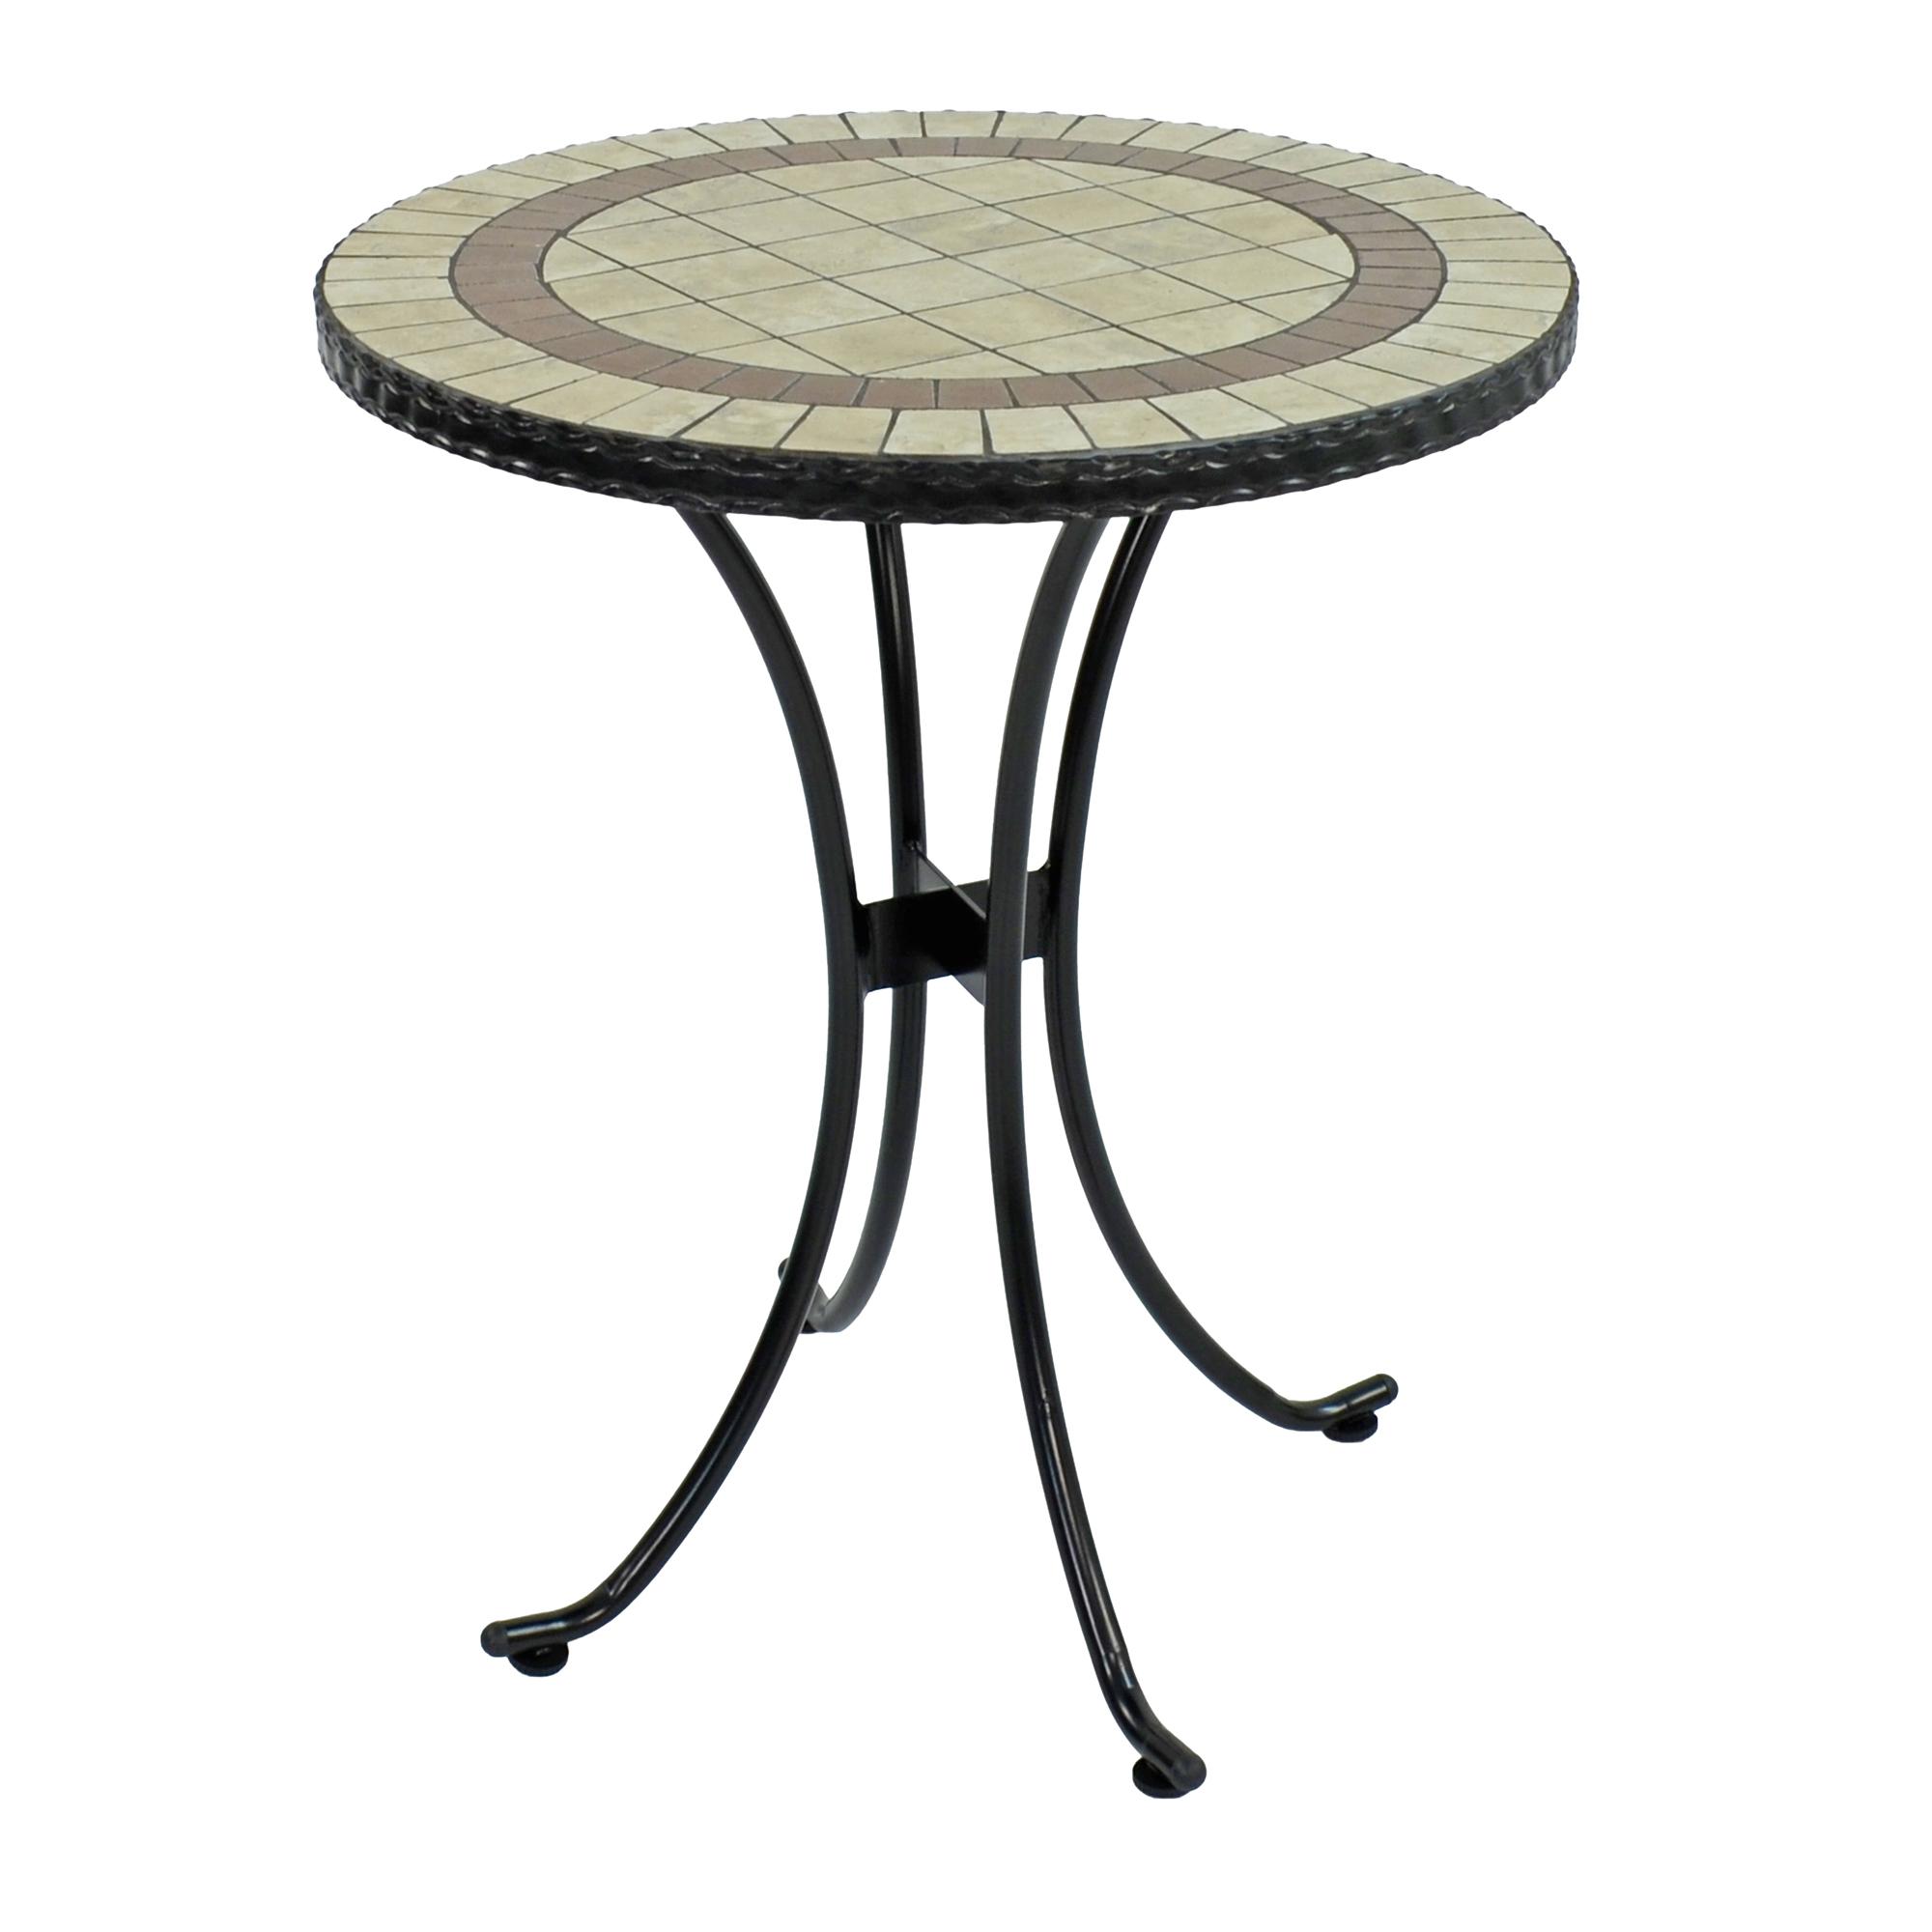 HENLEY 60CM BISTRO TABLE PROFILE WS1